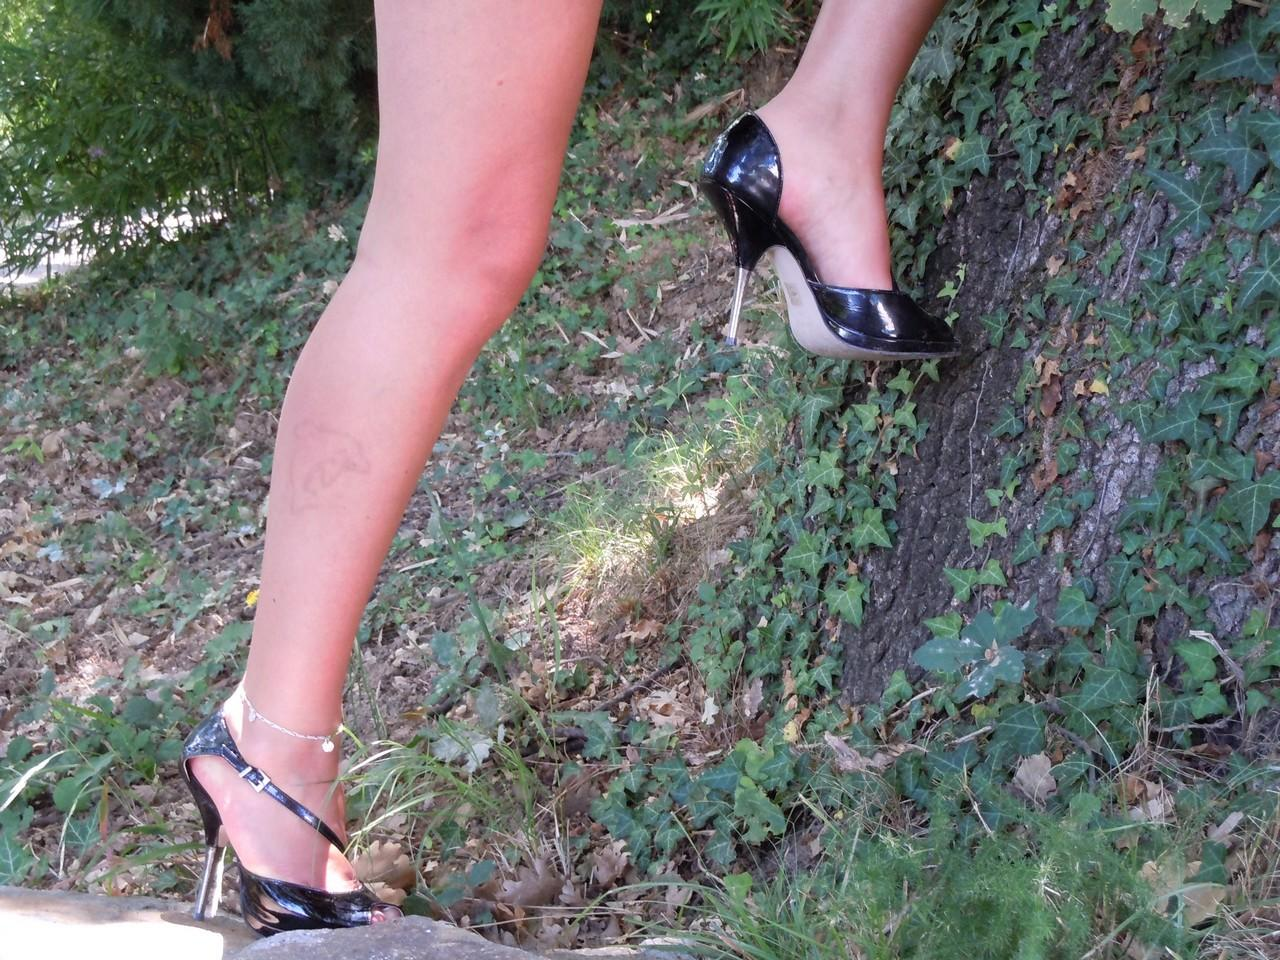 Red Bottom High Heels Women Shoes High Heel Extreme High Heels Sexy High Heels Fetish High Heels